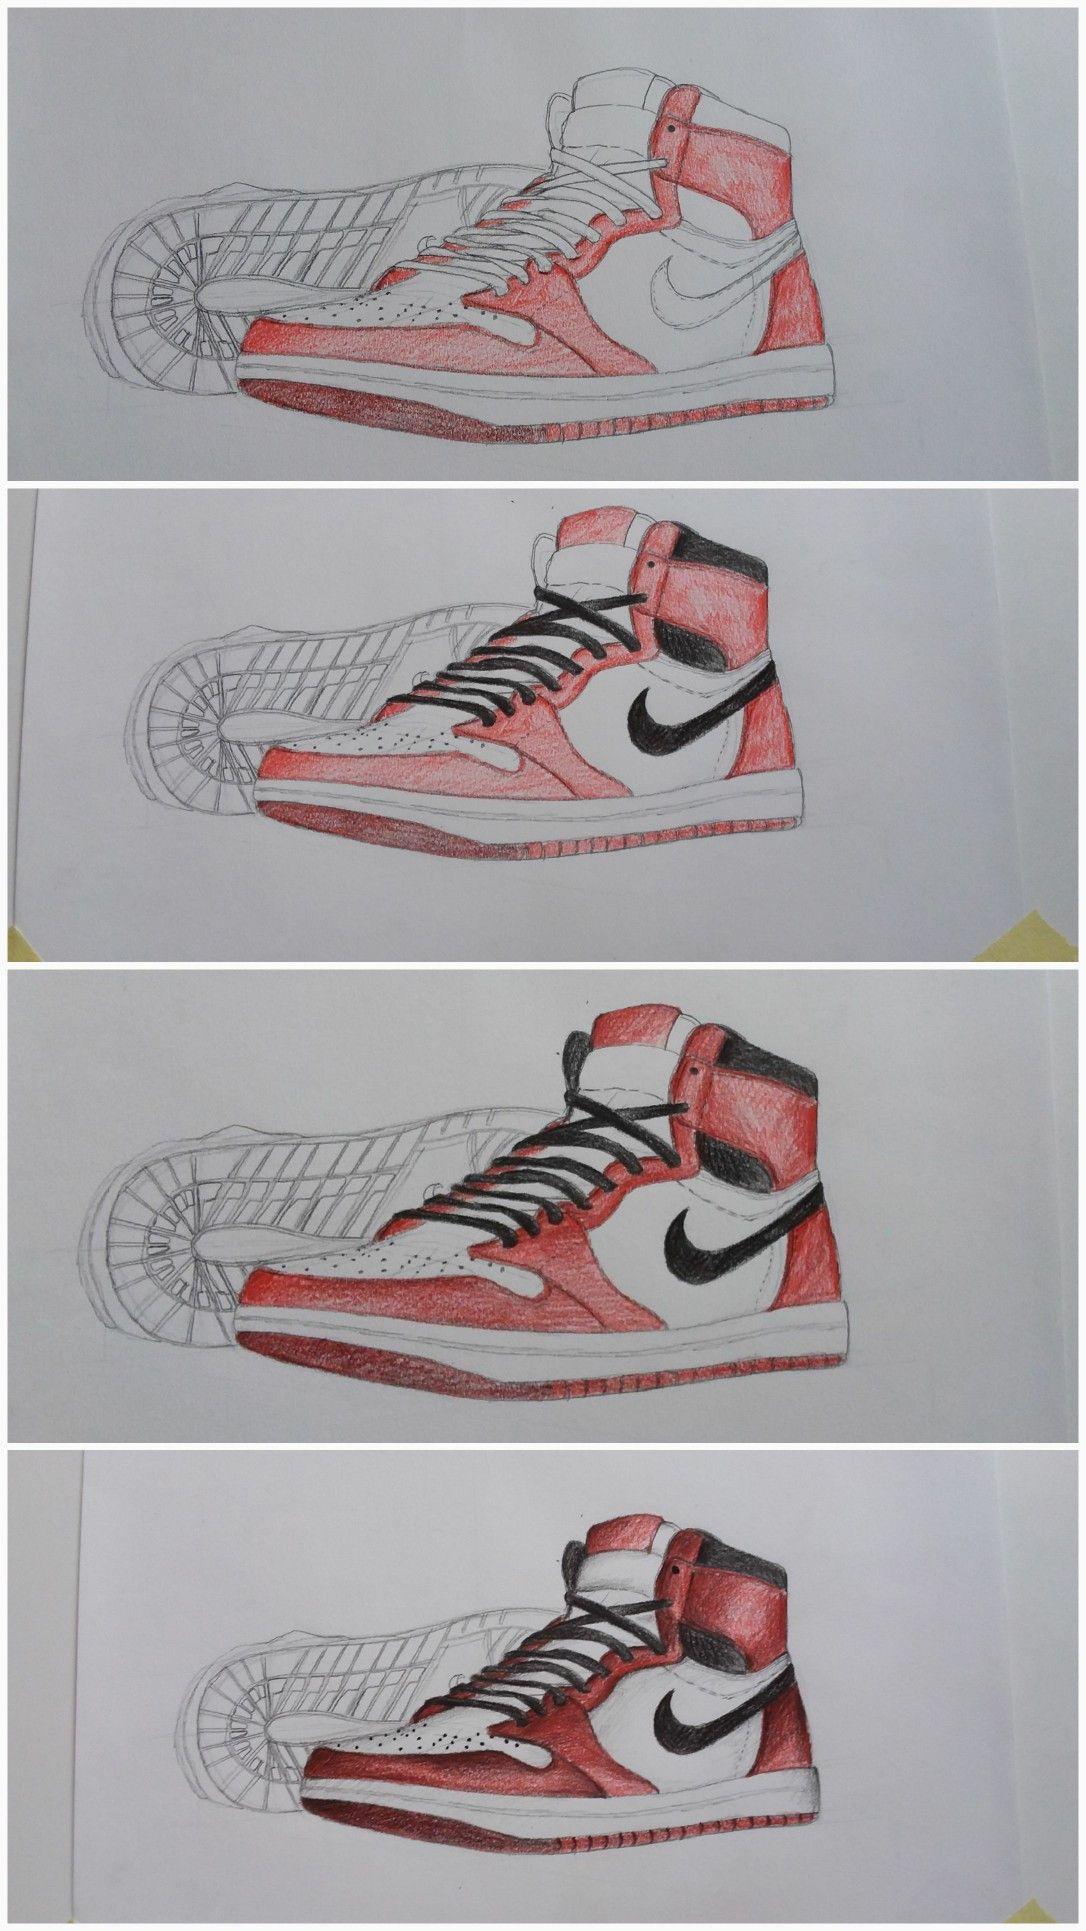 《Nike shoes drawing pencil colors》 Pencil art drawings